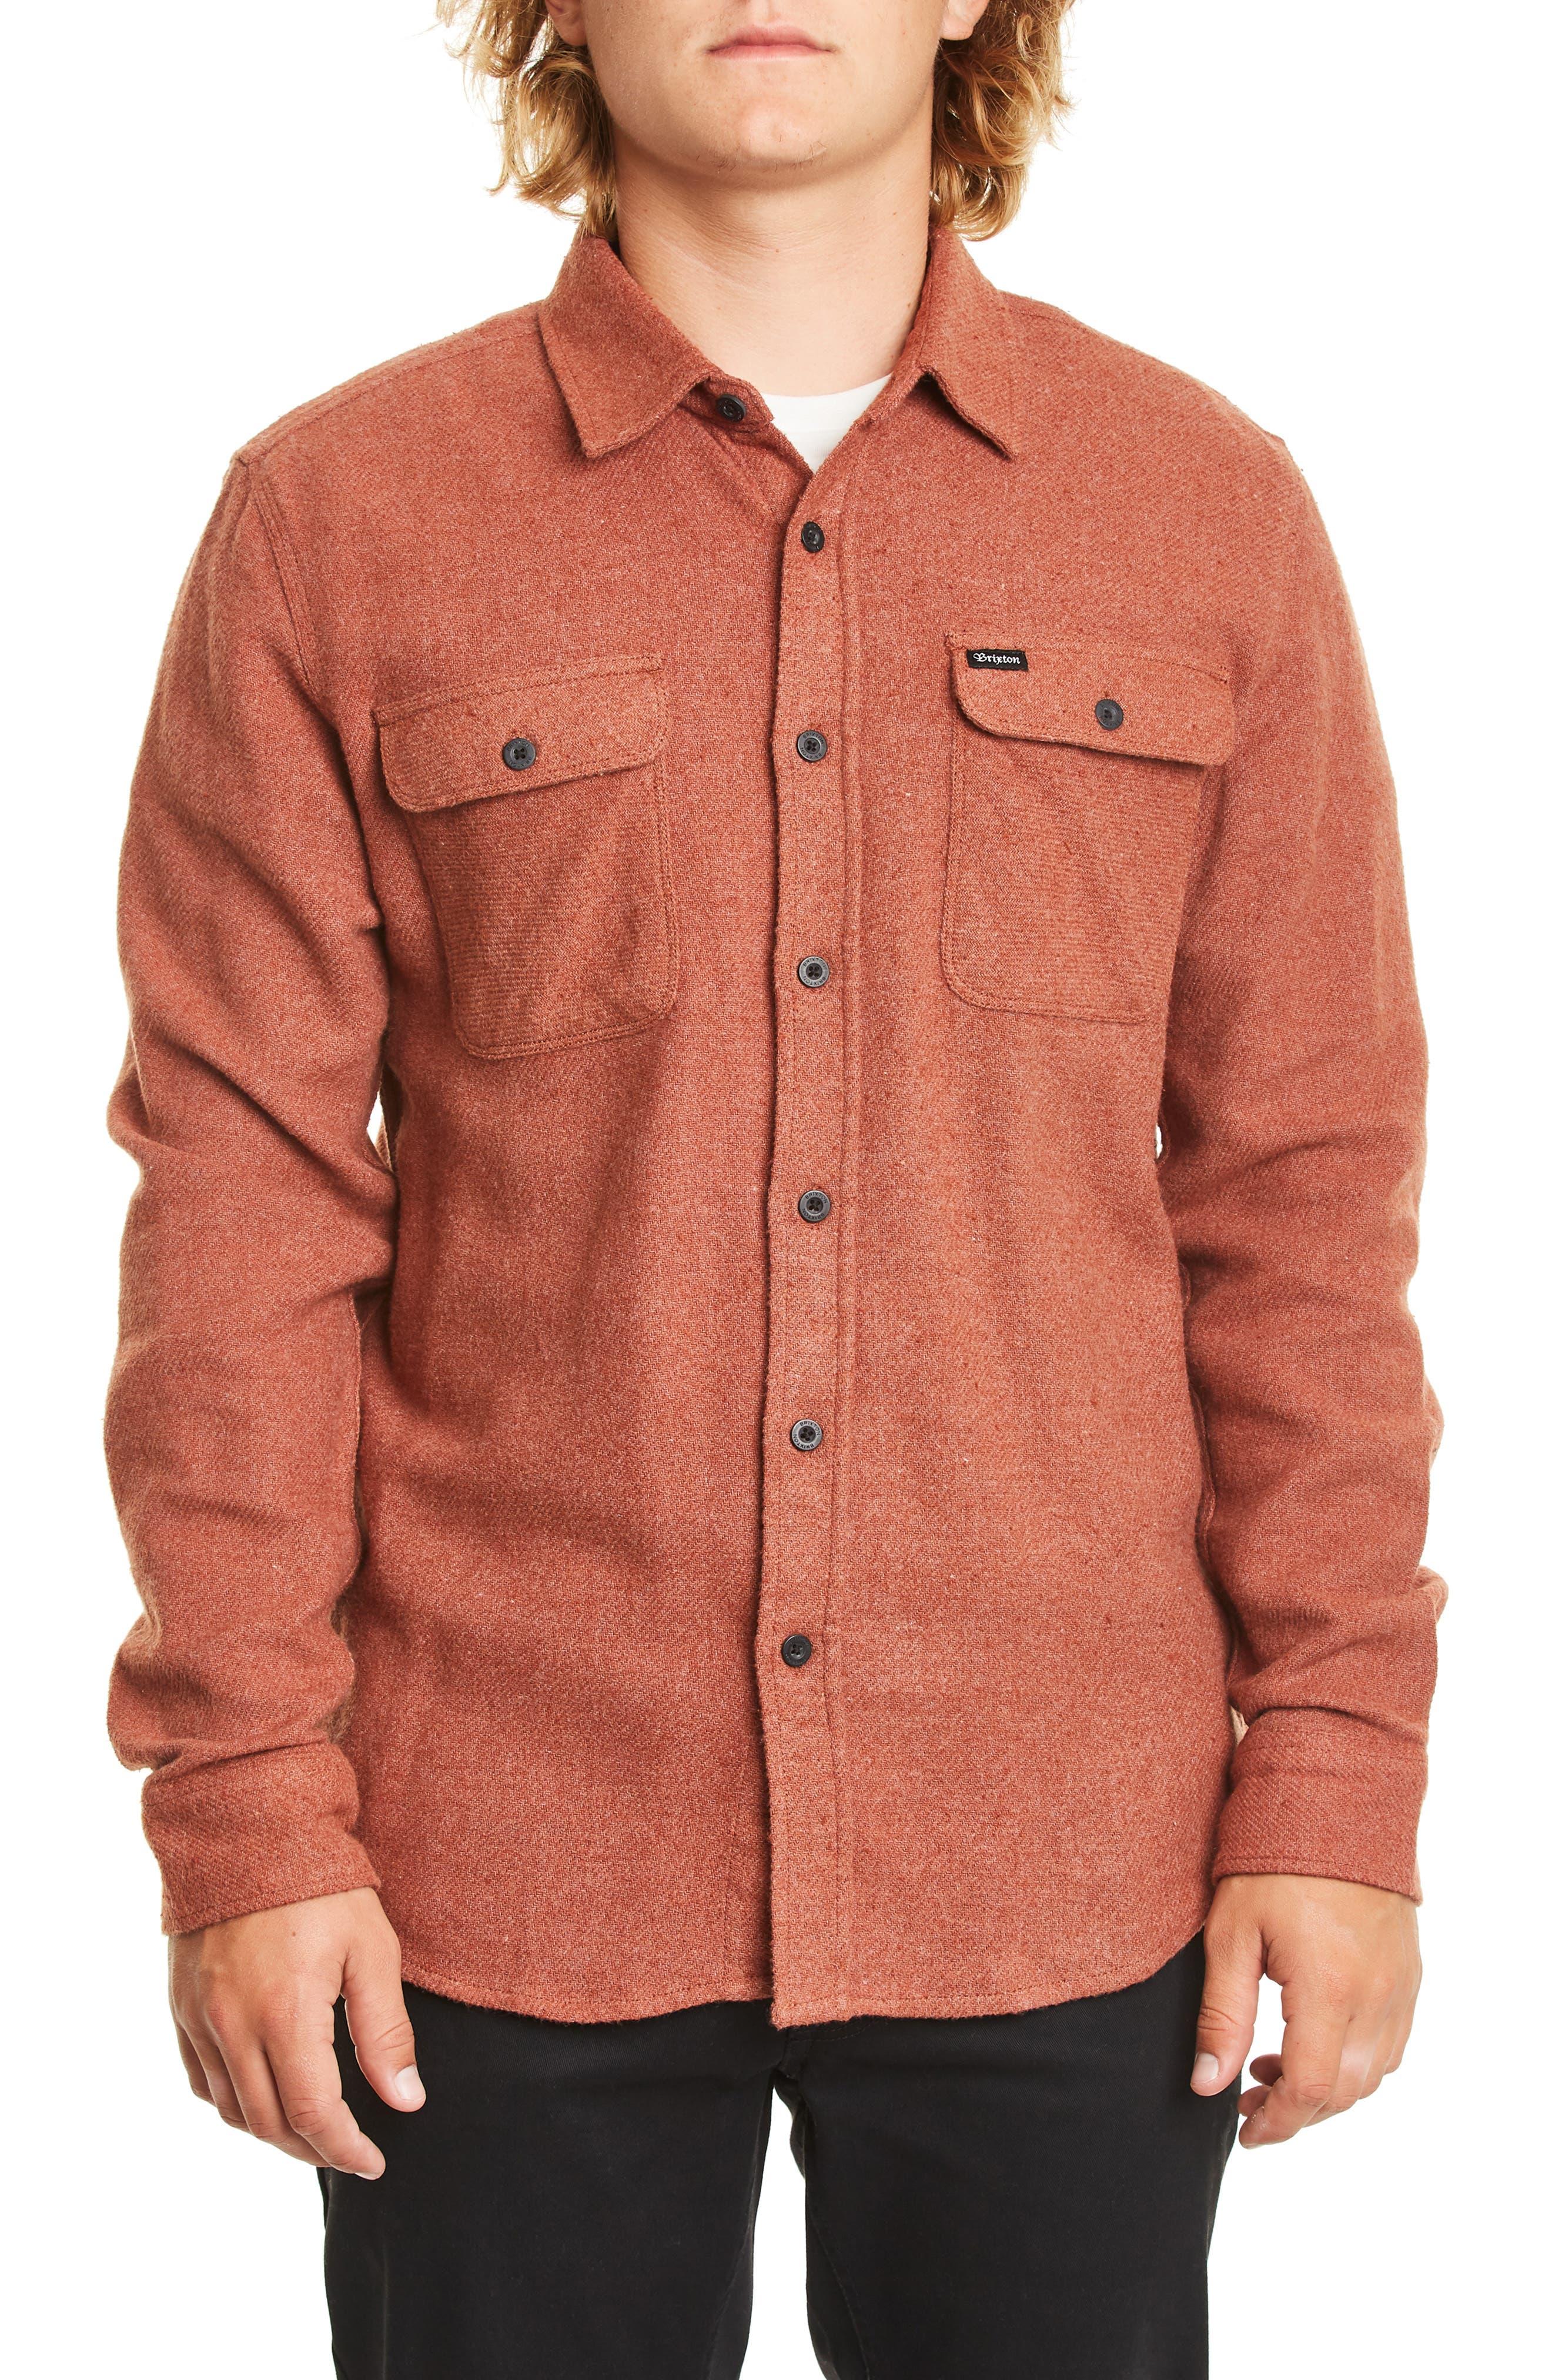 BRIXTON Bowery Twill Work Shirt, Main, color, CLAY